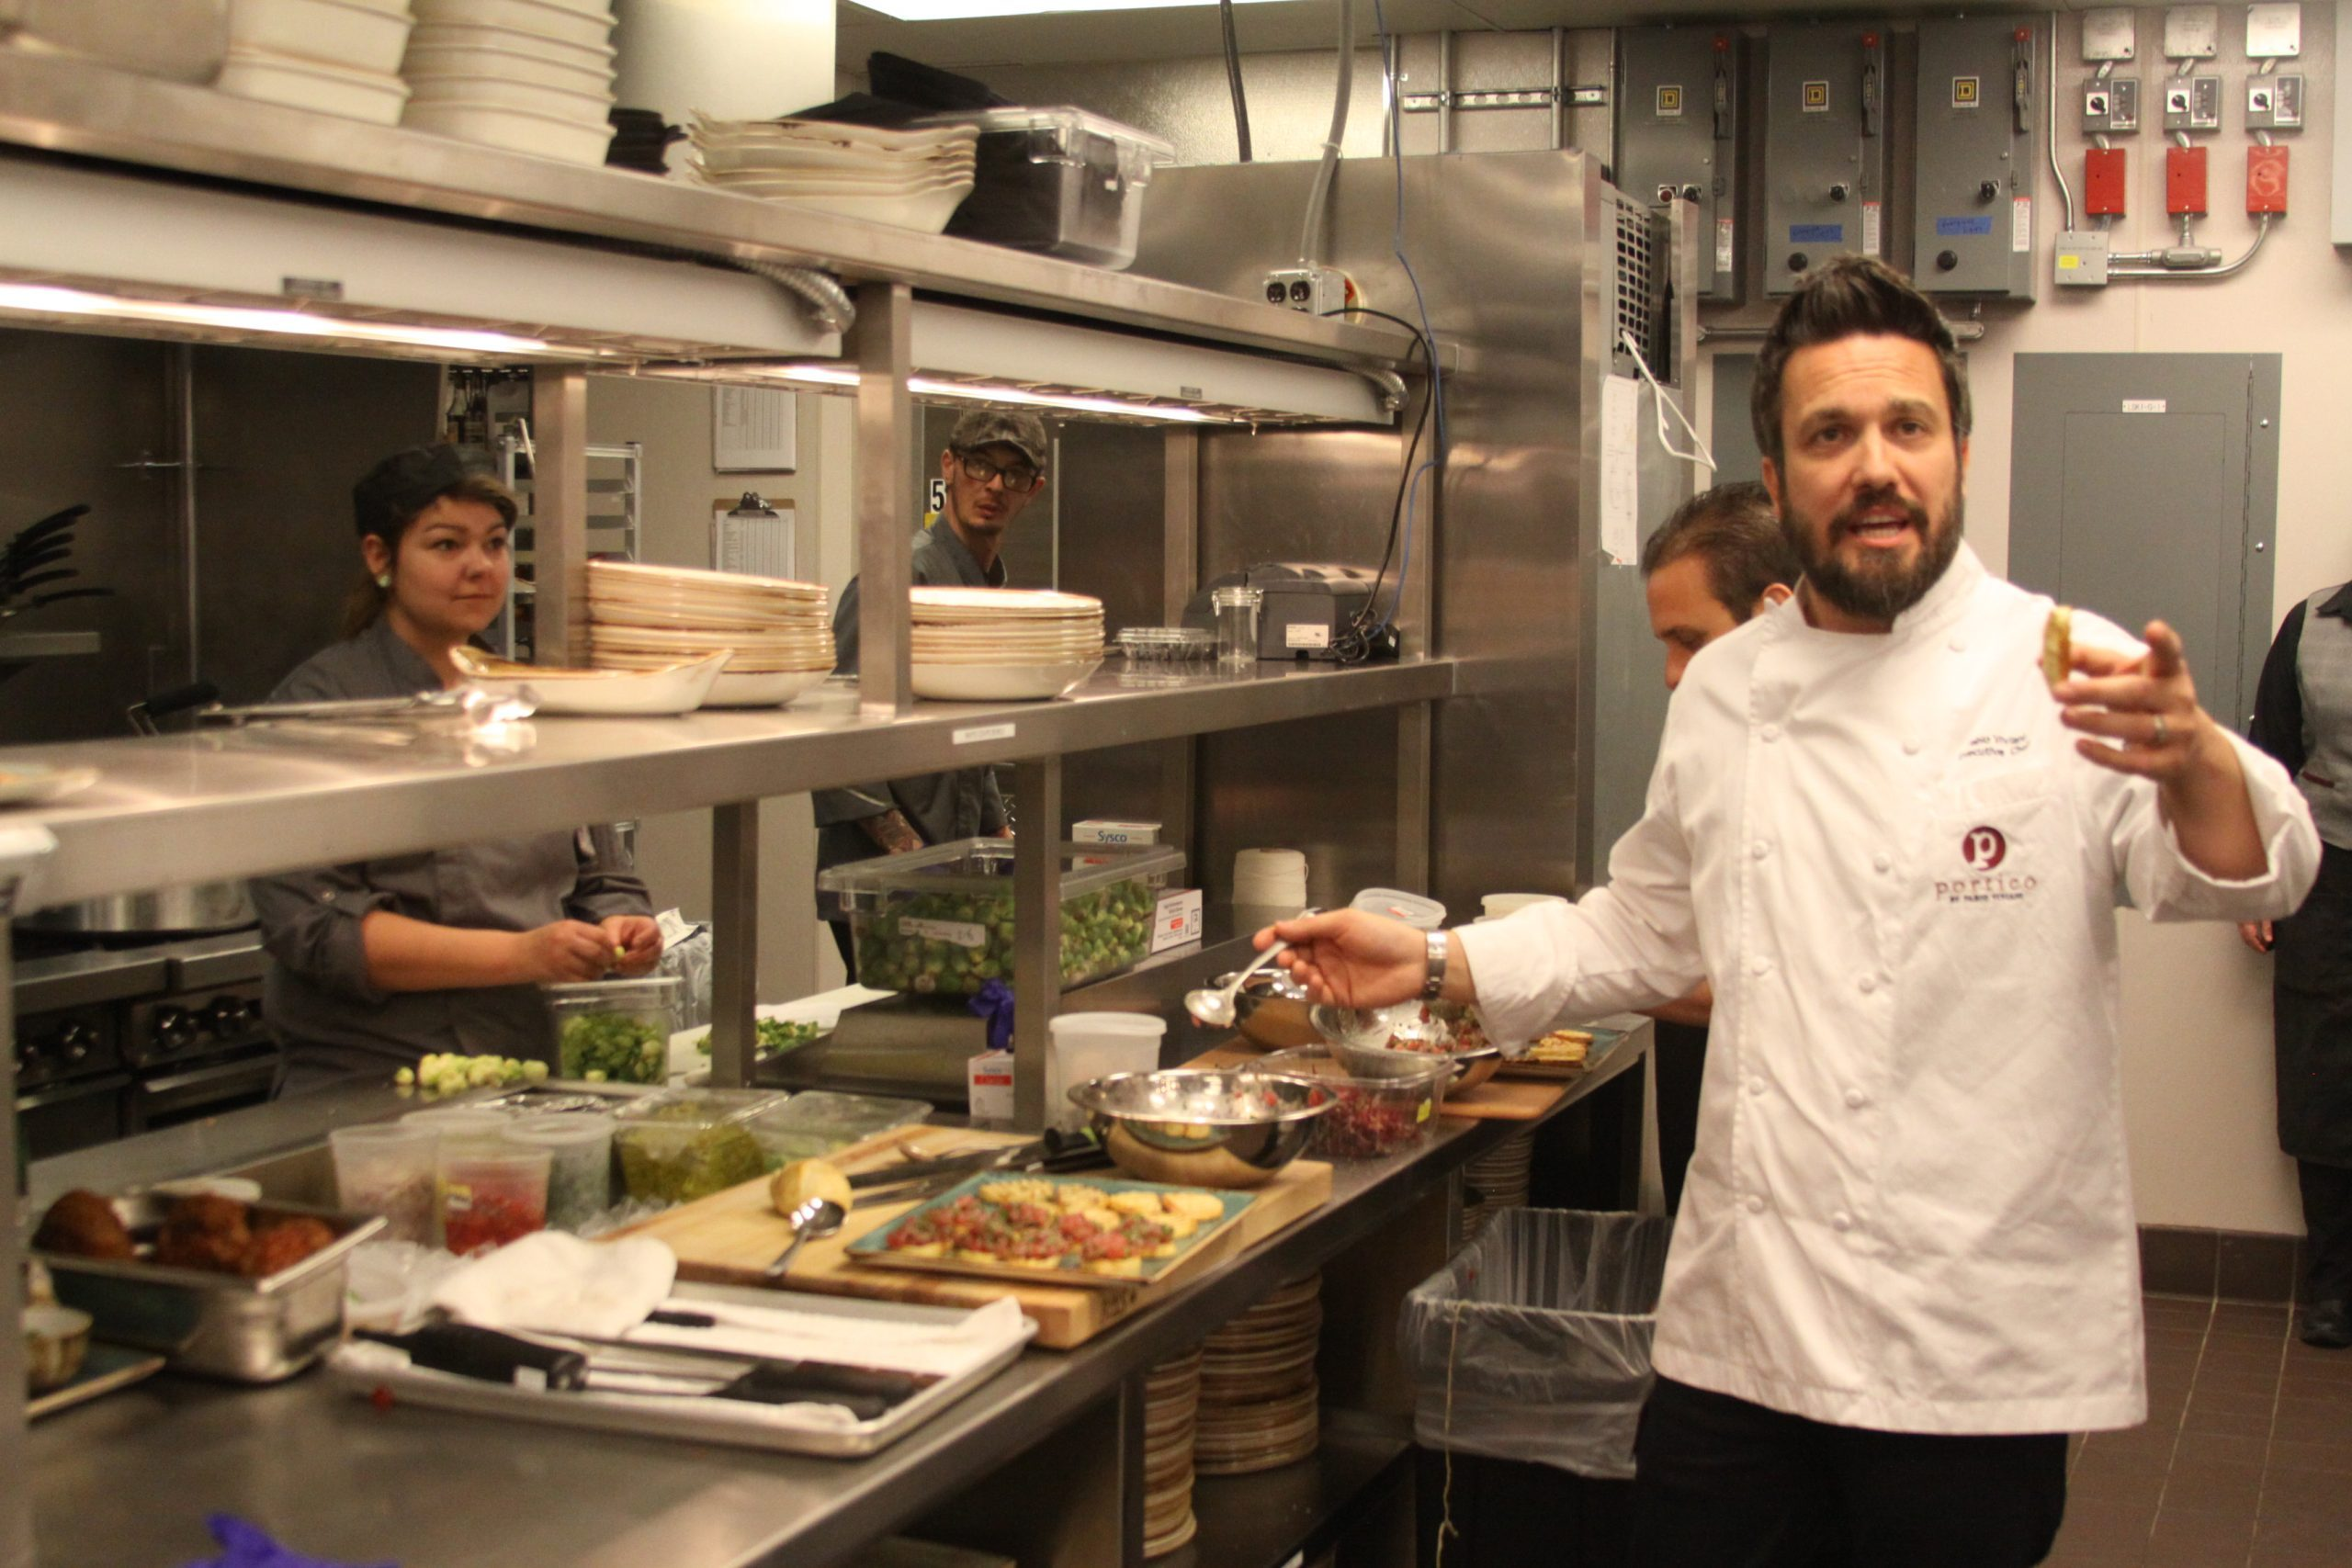 Cook with Celebrity Chef Fabio Viviani